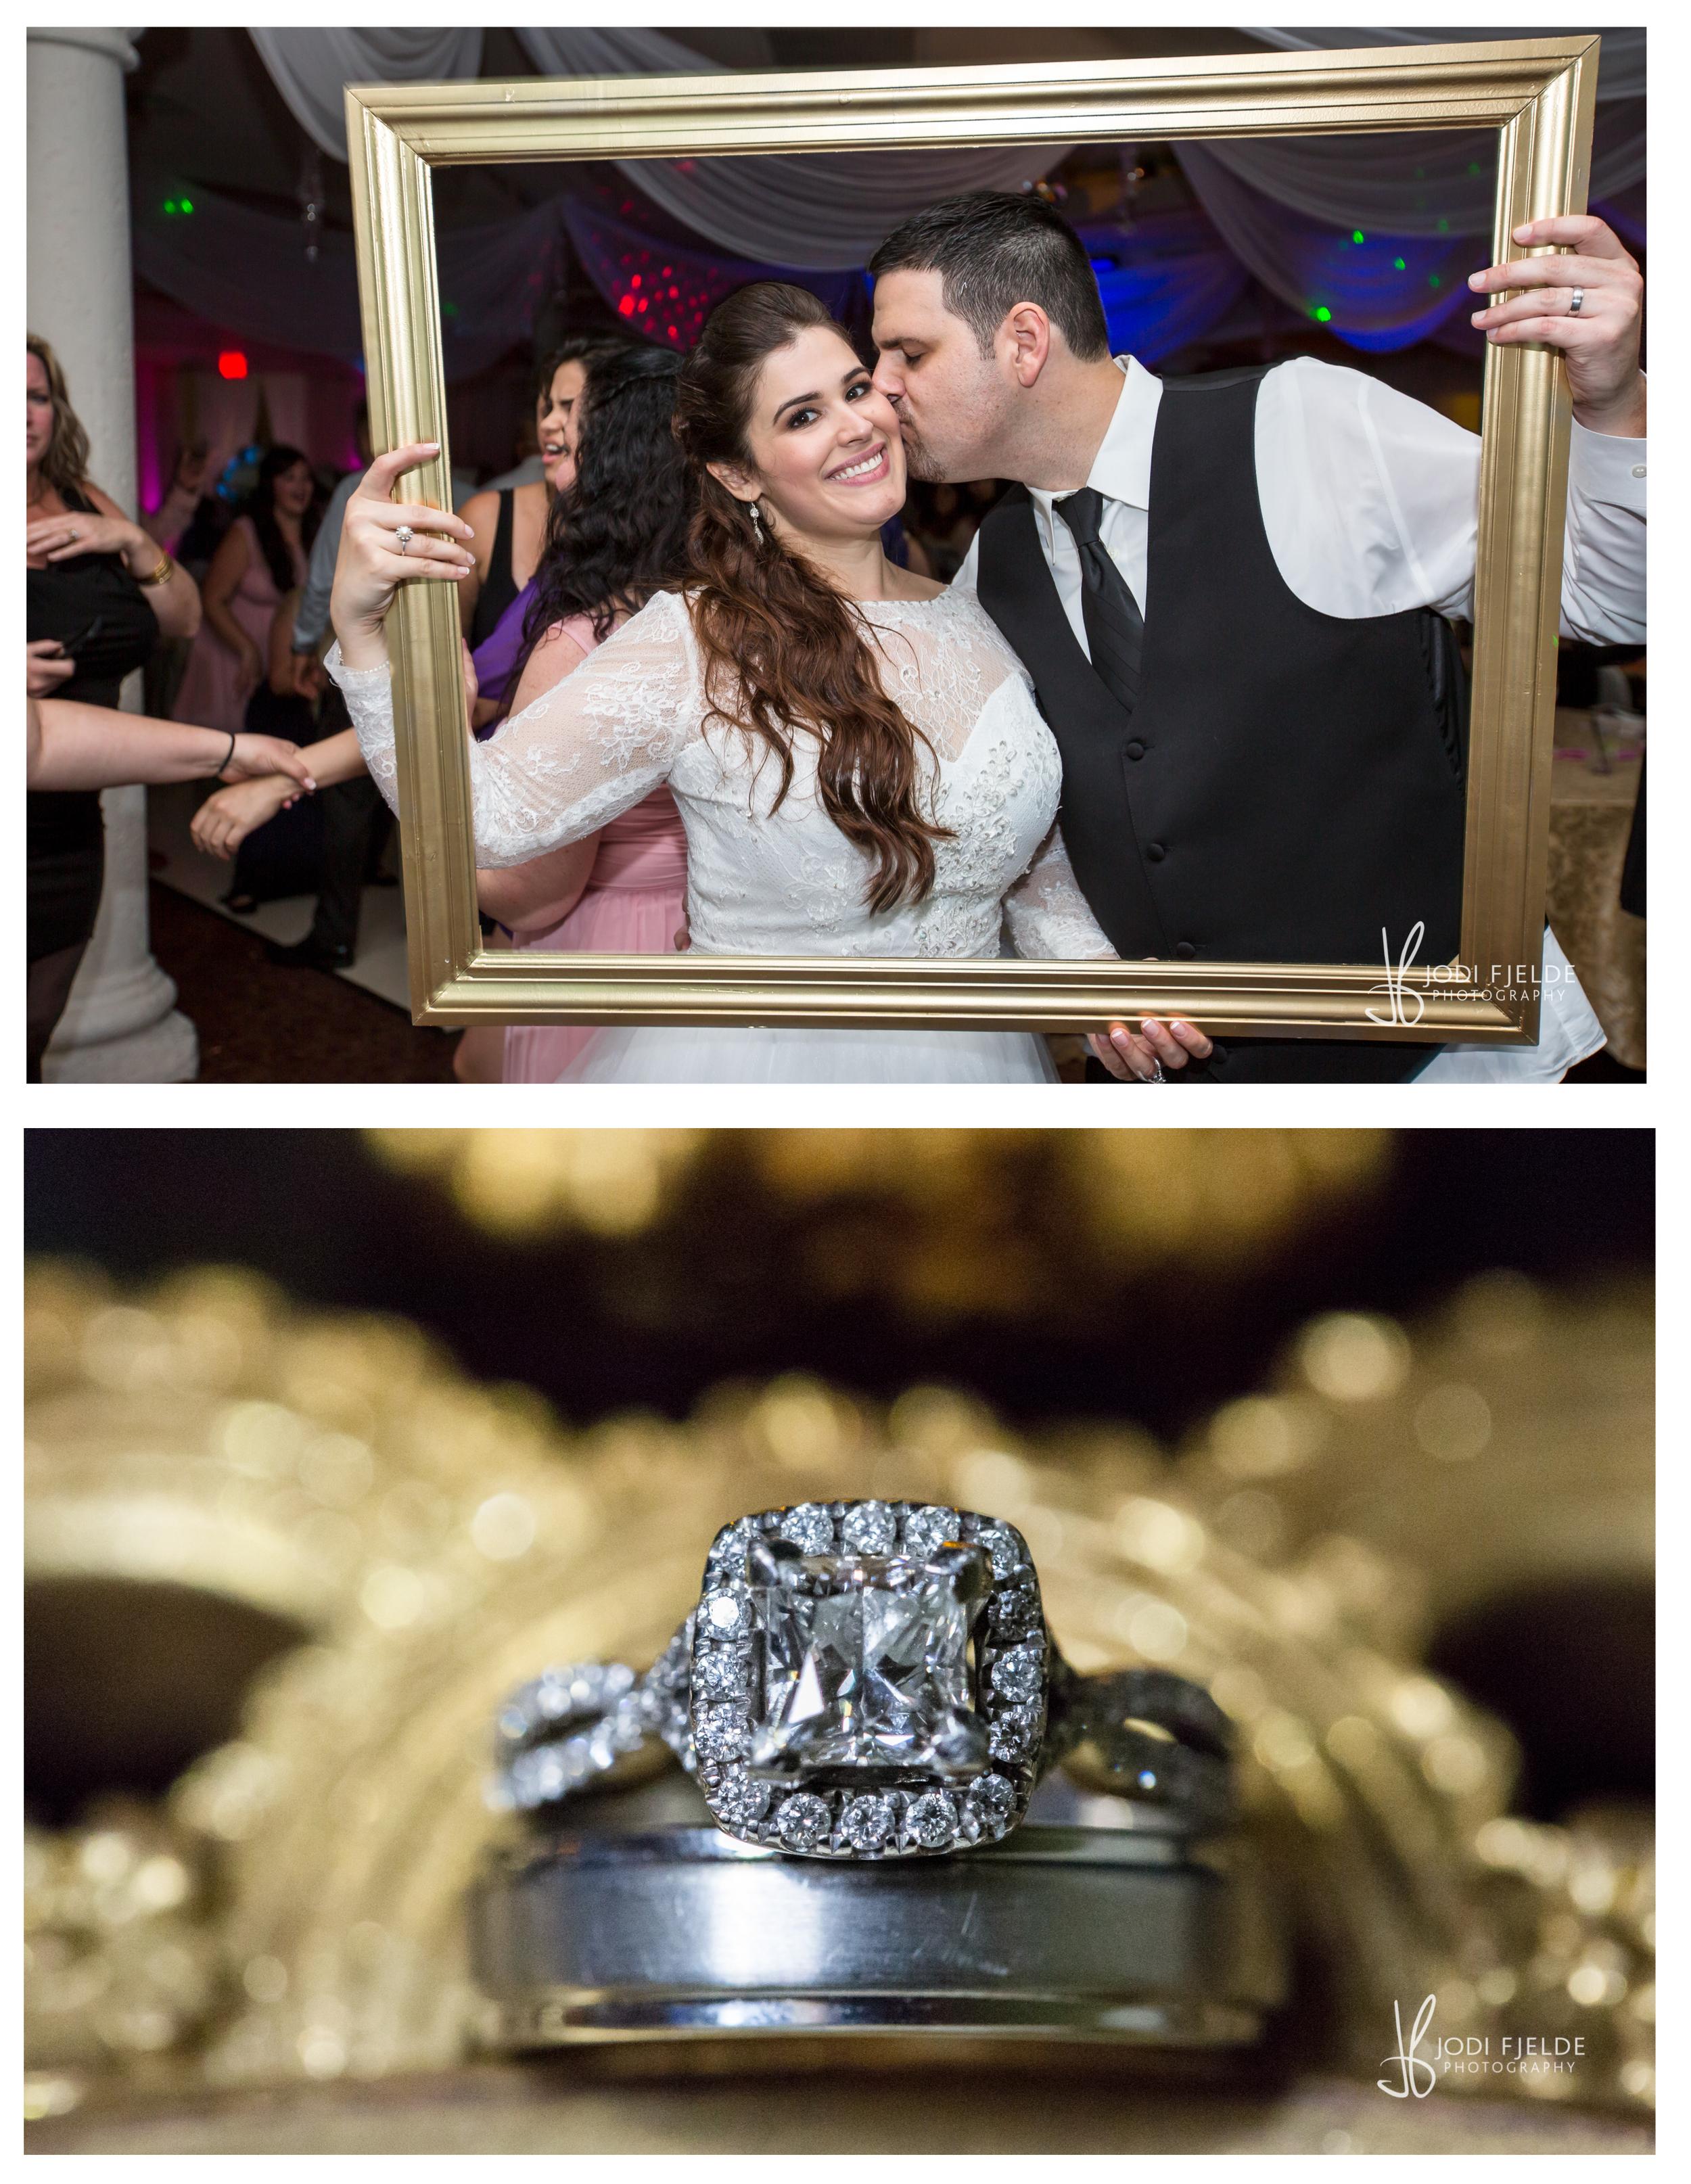 Ballroom Wedding_Ft Lauderdale_Florida_wedding_Maria_&_Juan_photography_jodi_Fjelde_photography-26.jpg